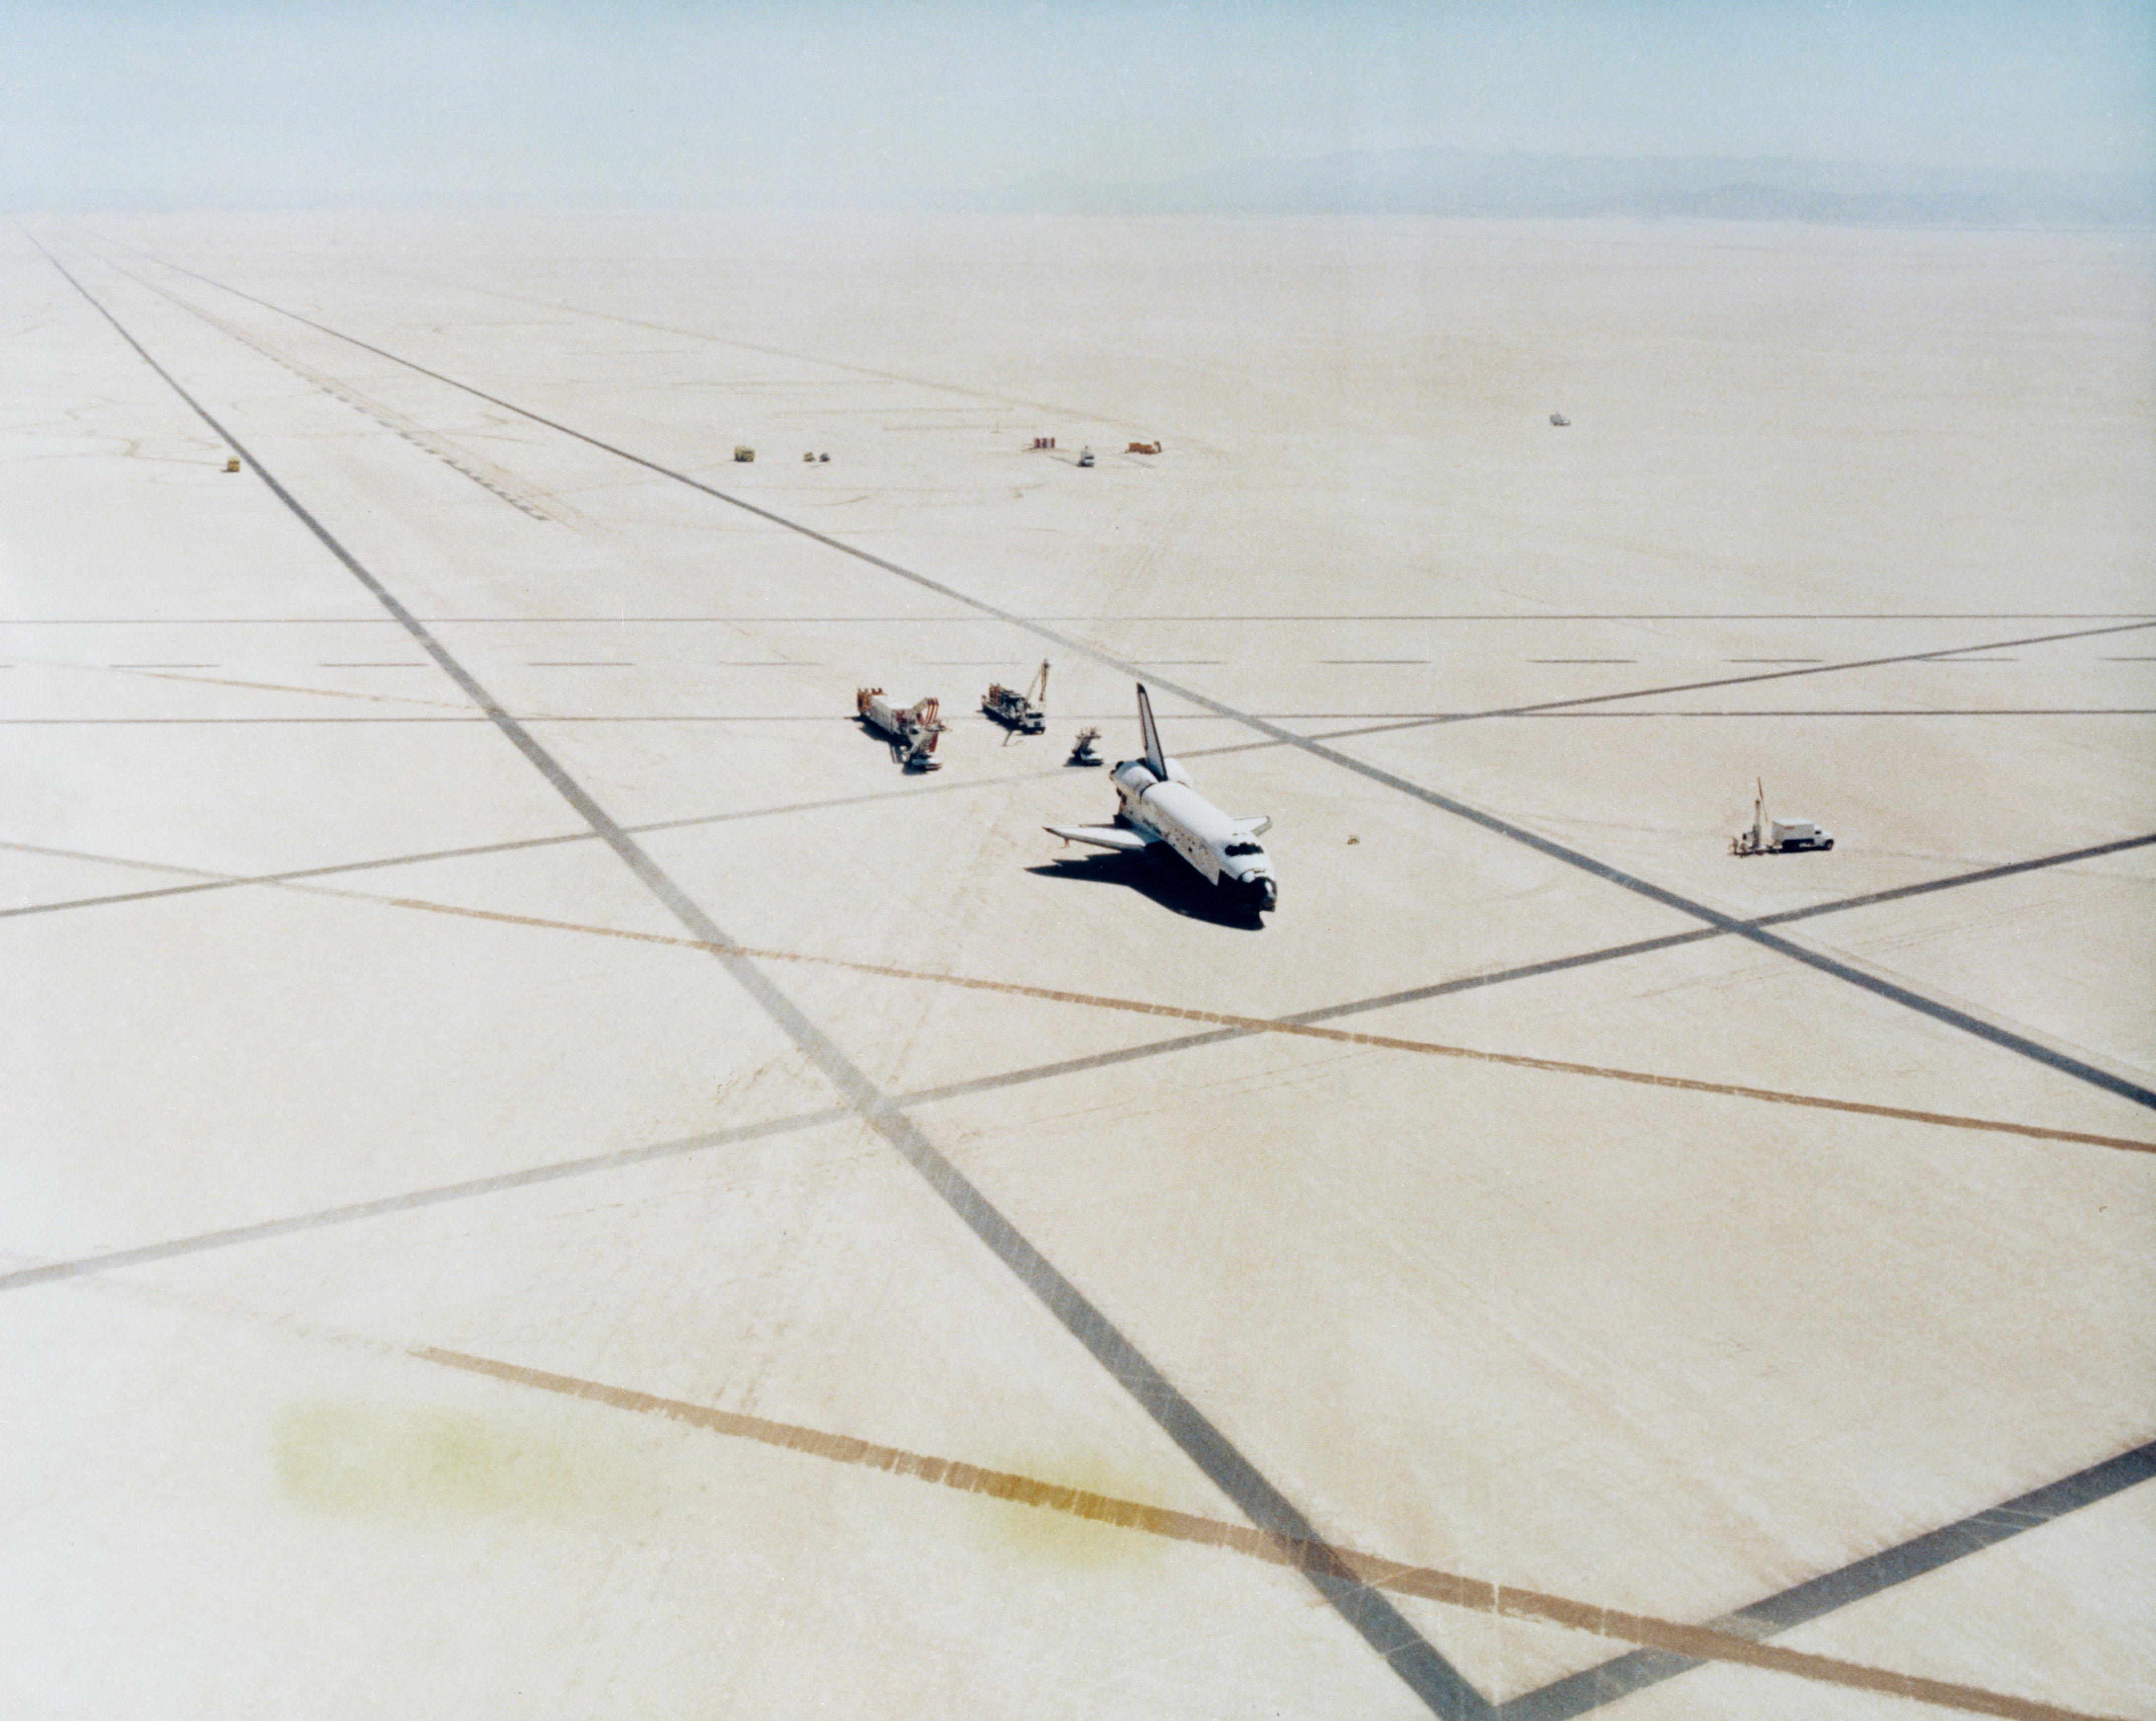 1st space shuttle flight - photo #22